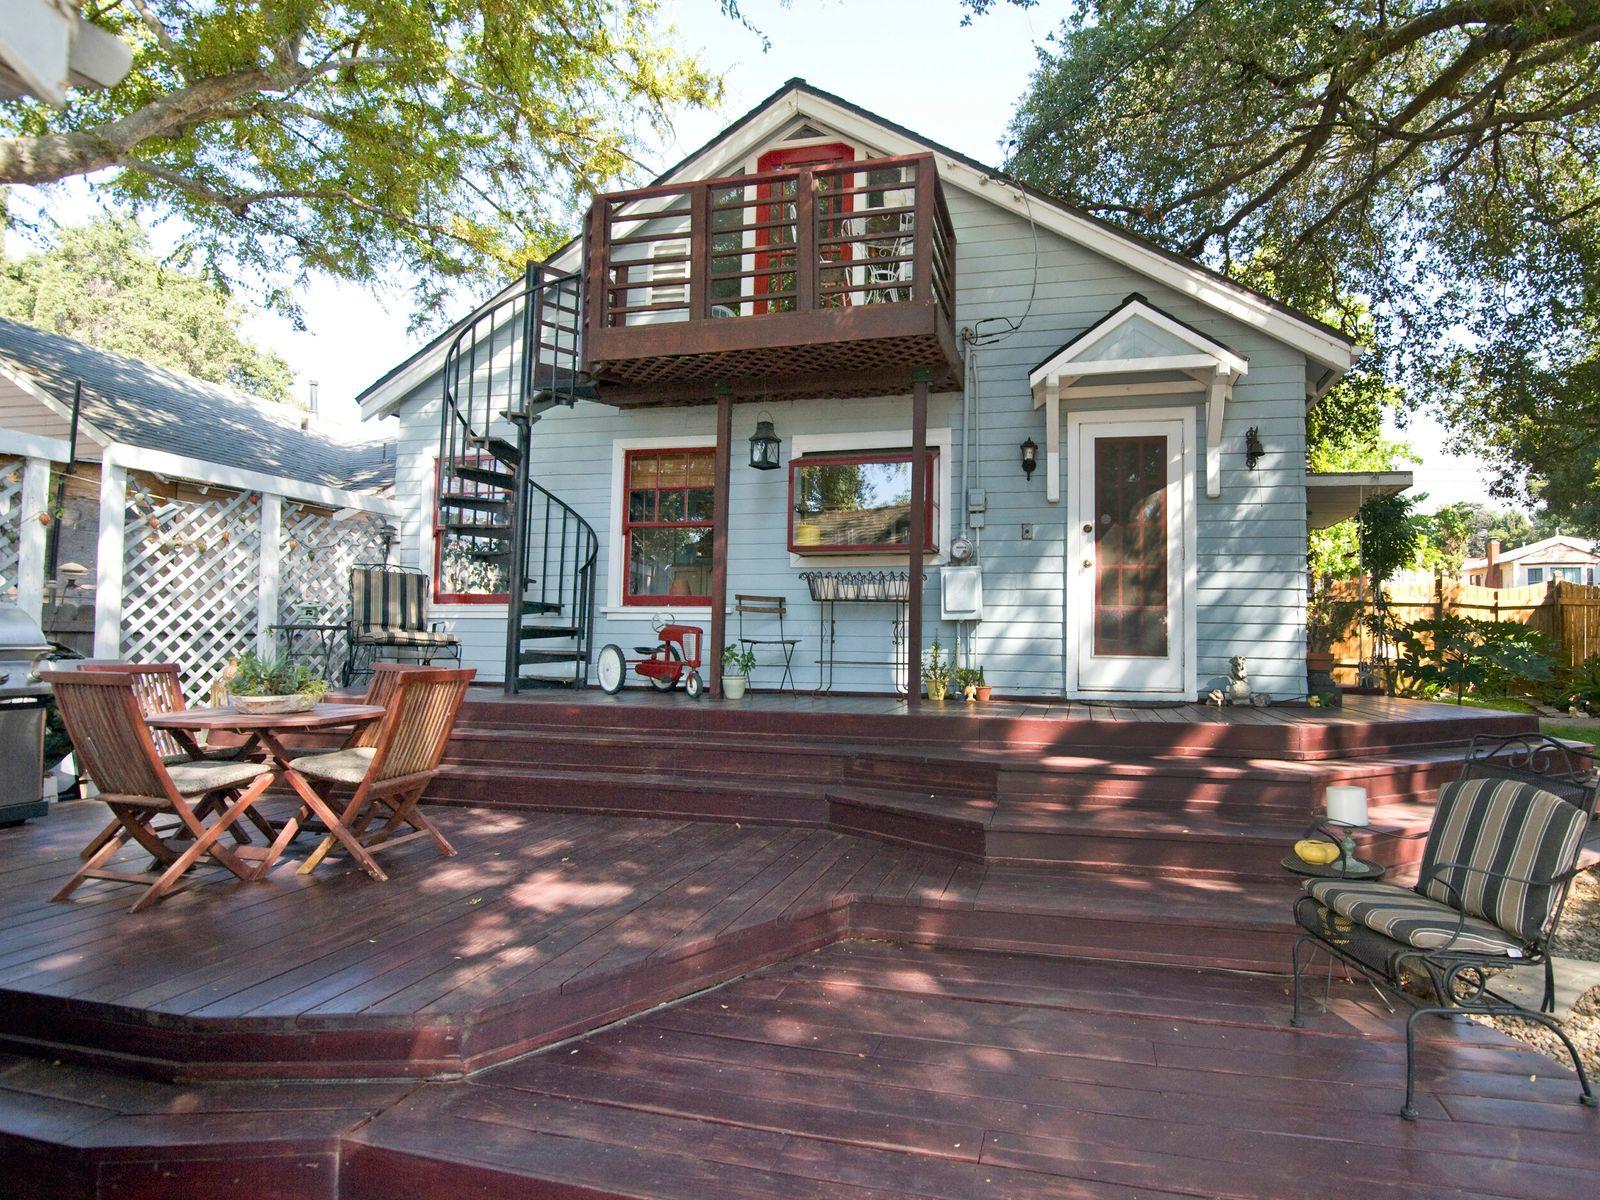 232 West Mariposa Street